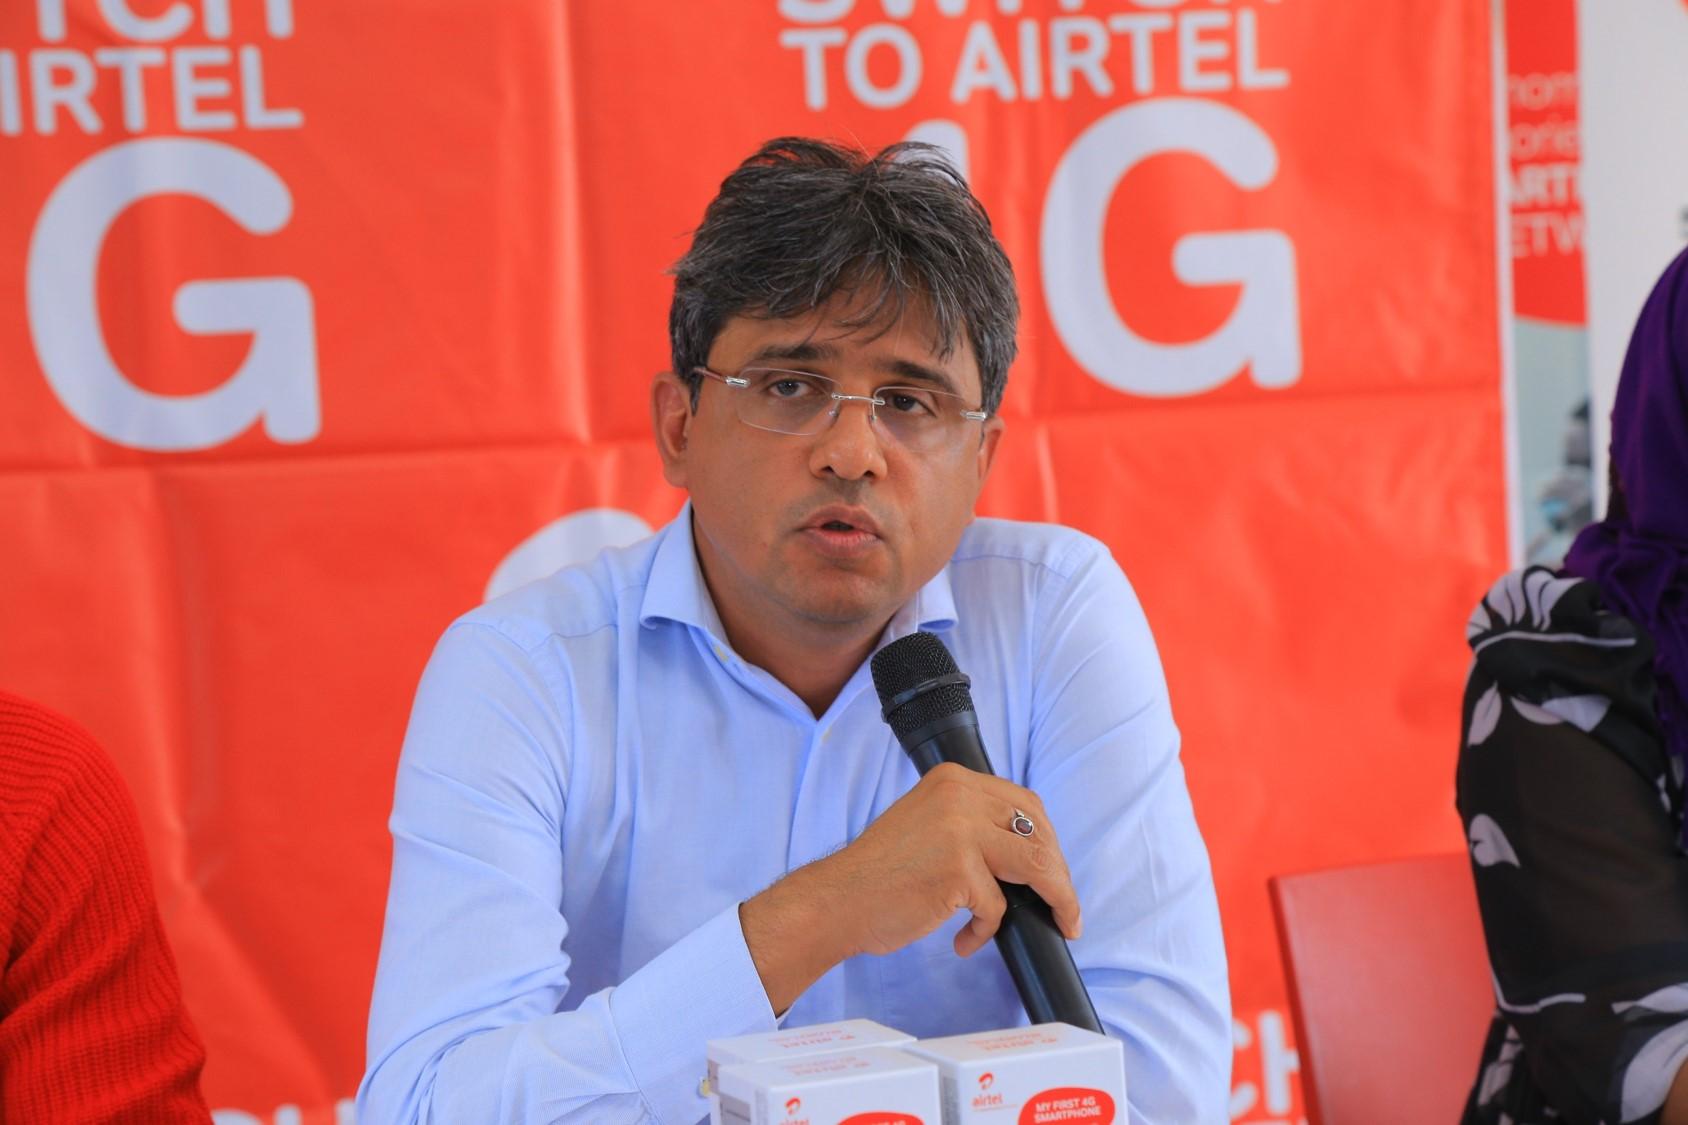 Amit Kapur, Airtel Uganda CCO